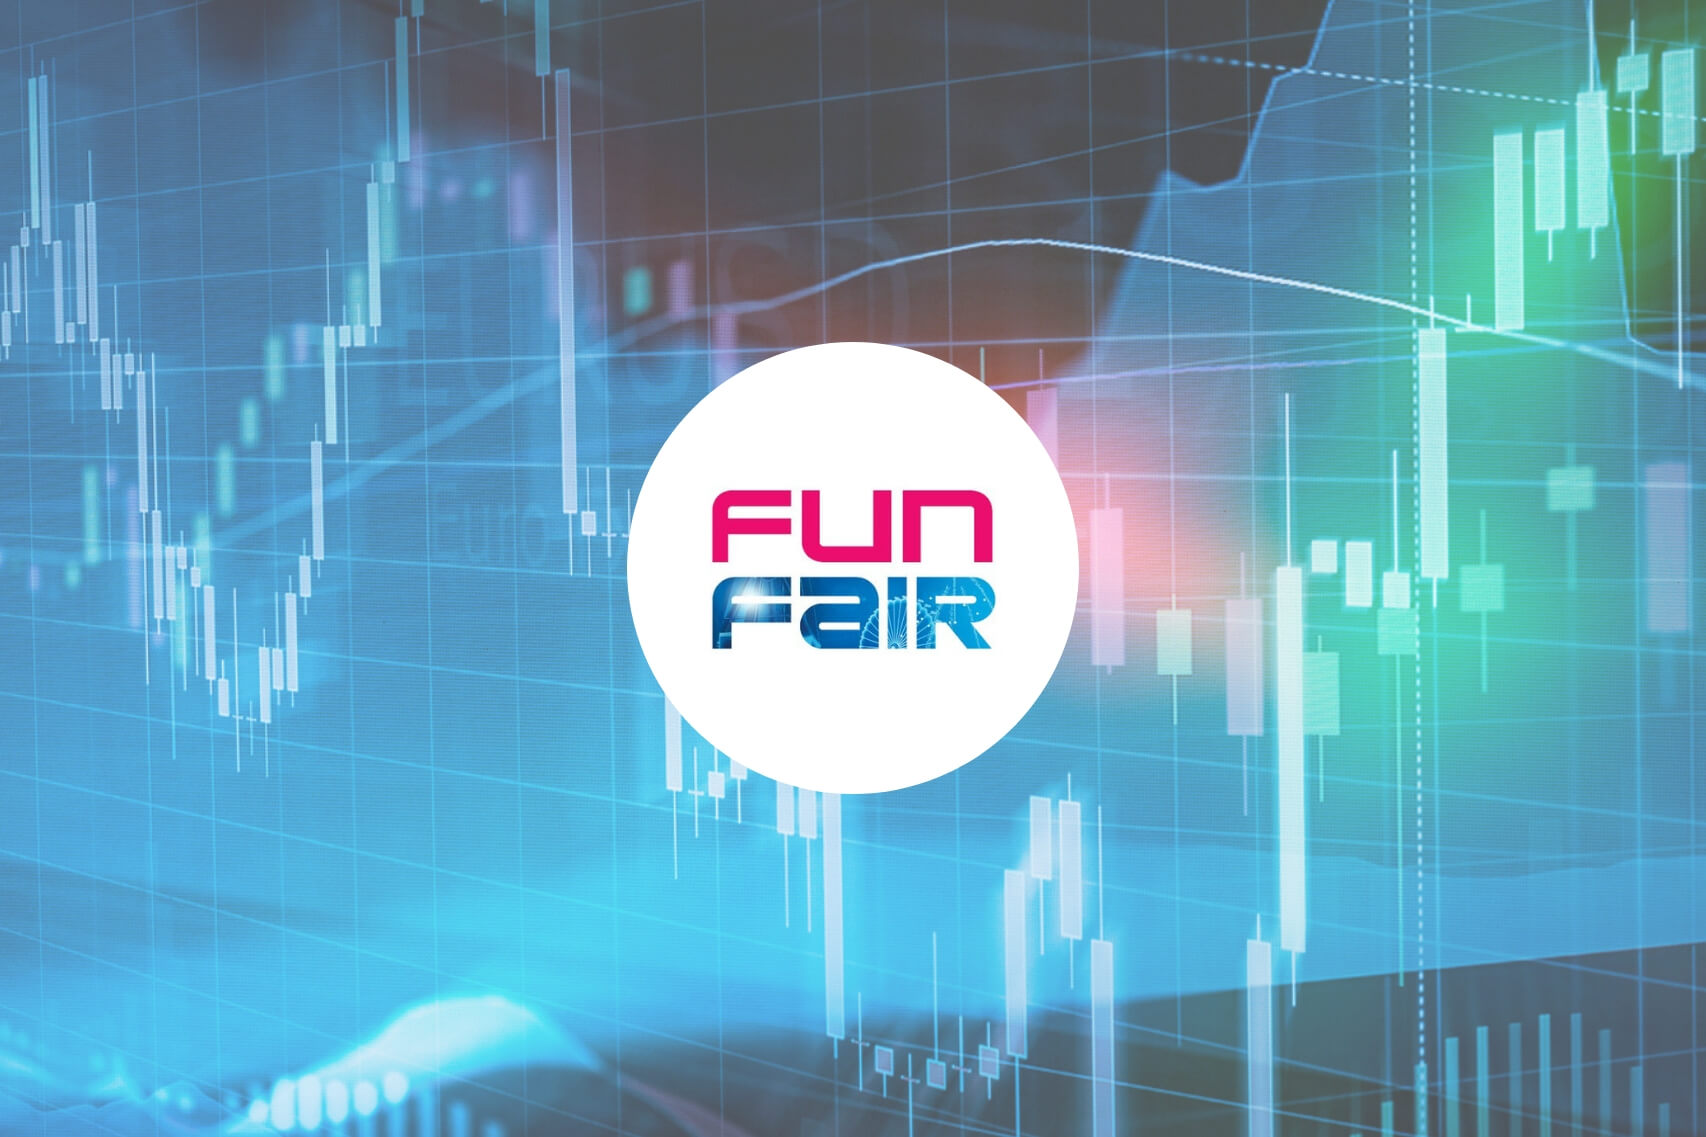 Price Analysis: FunFair